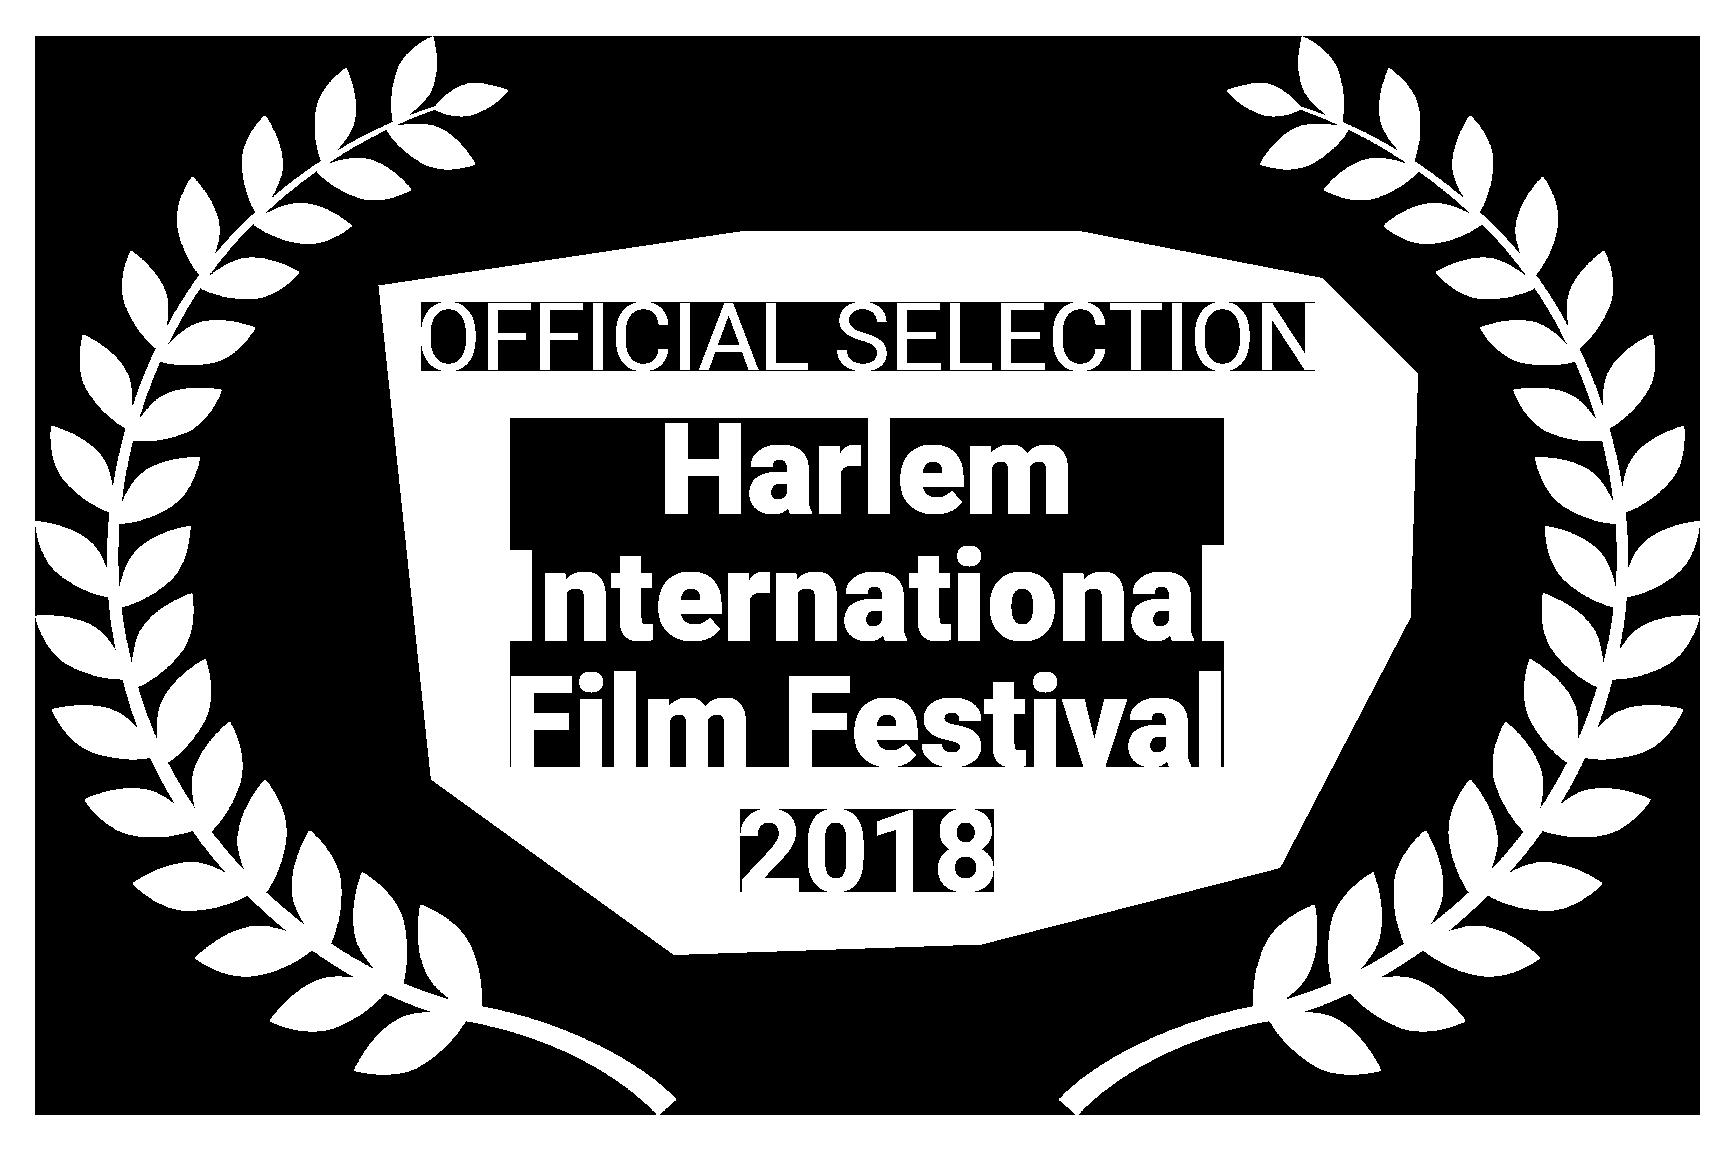 OFFICIAL SELECTION Harlem International Film Festival 2018